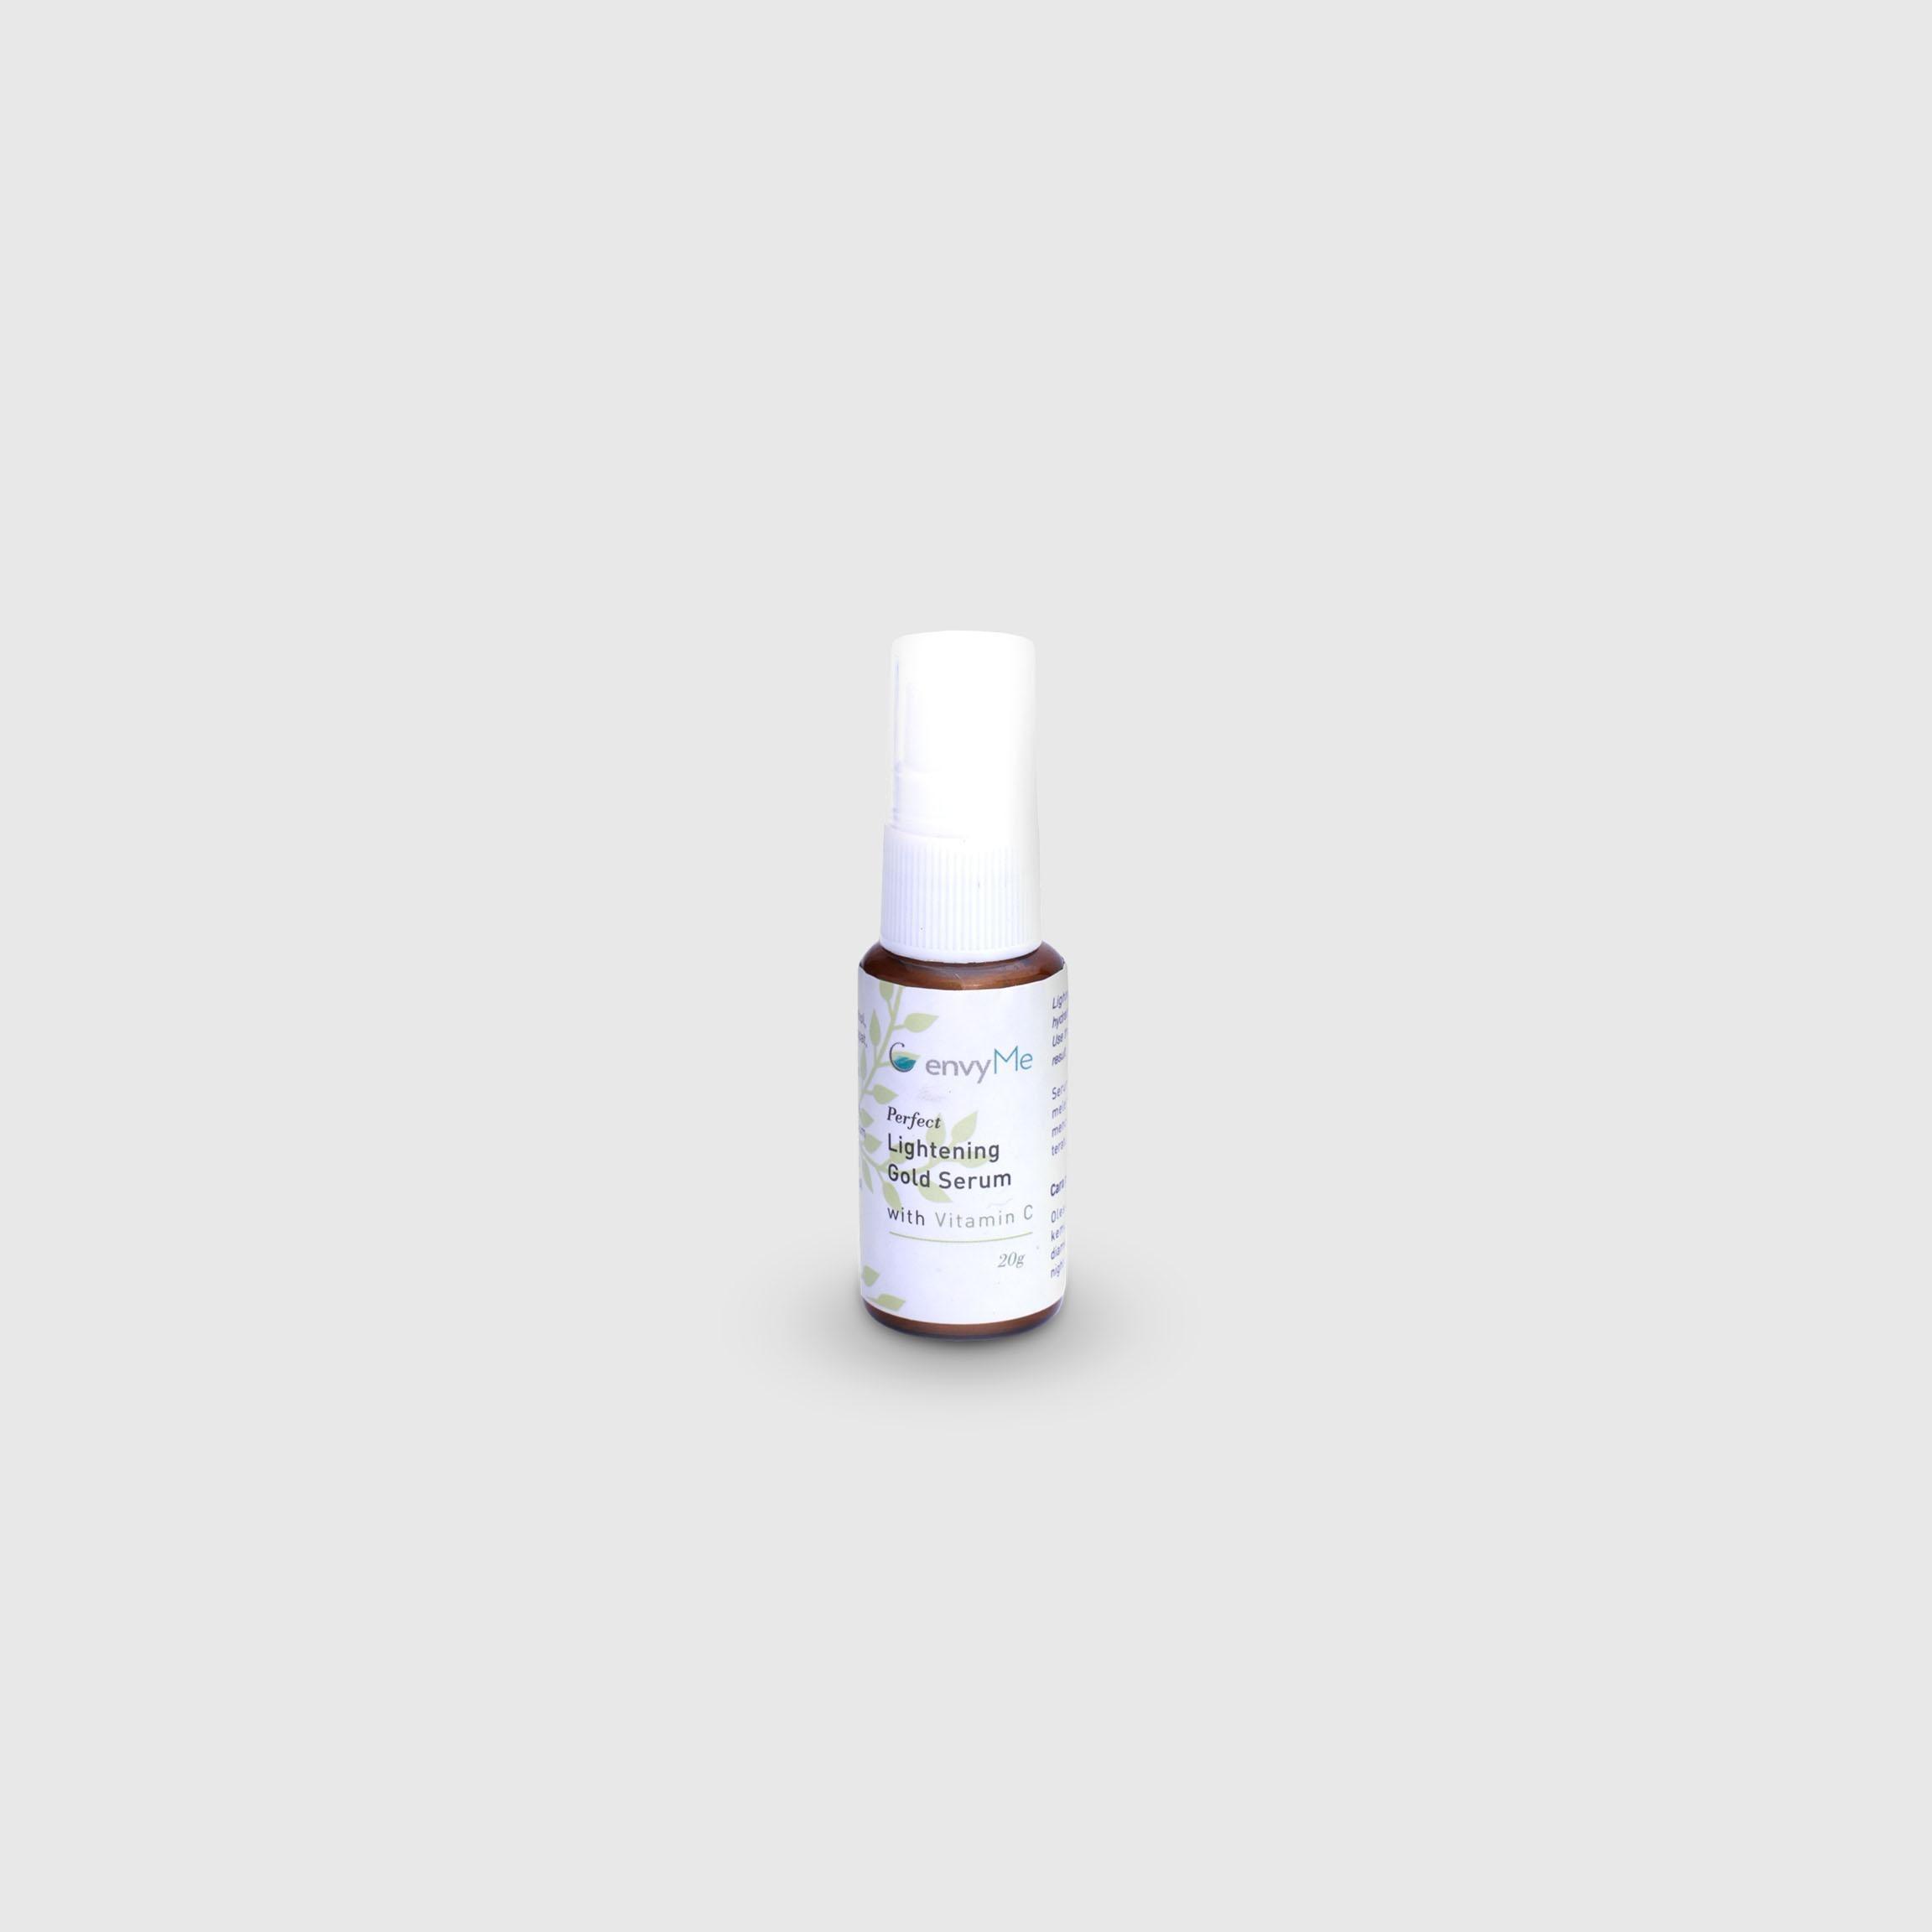 ENVYGREEN Perfect Lightening Gold Serum With Vitamin C